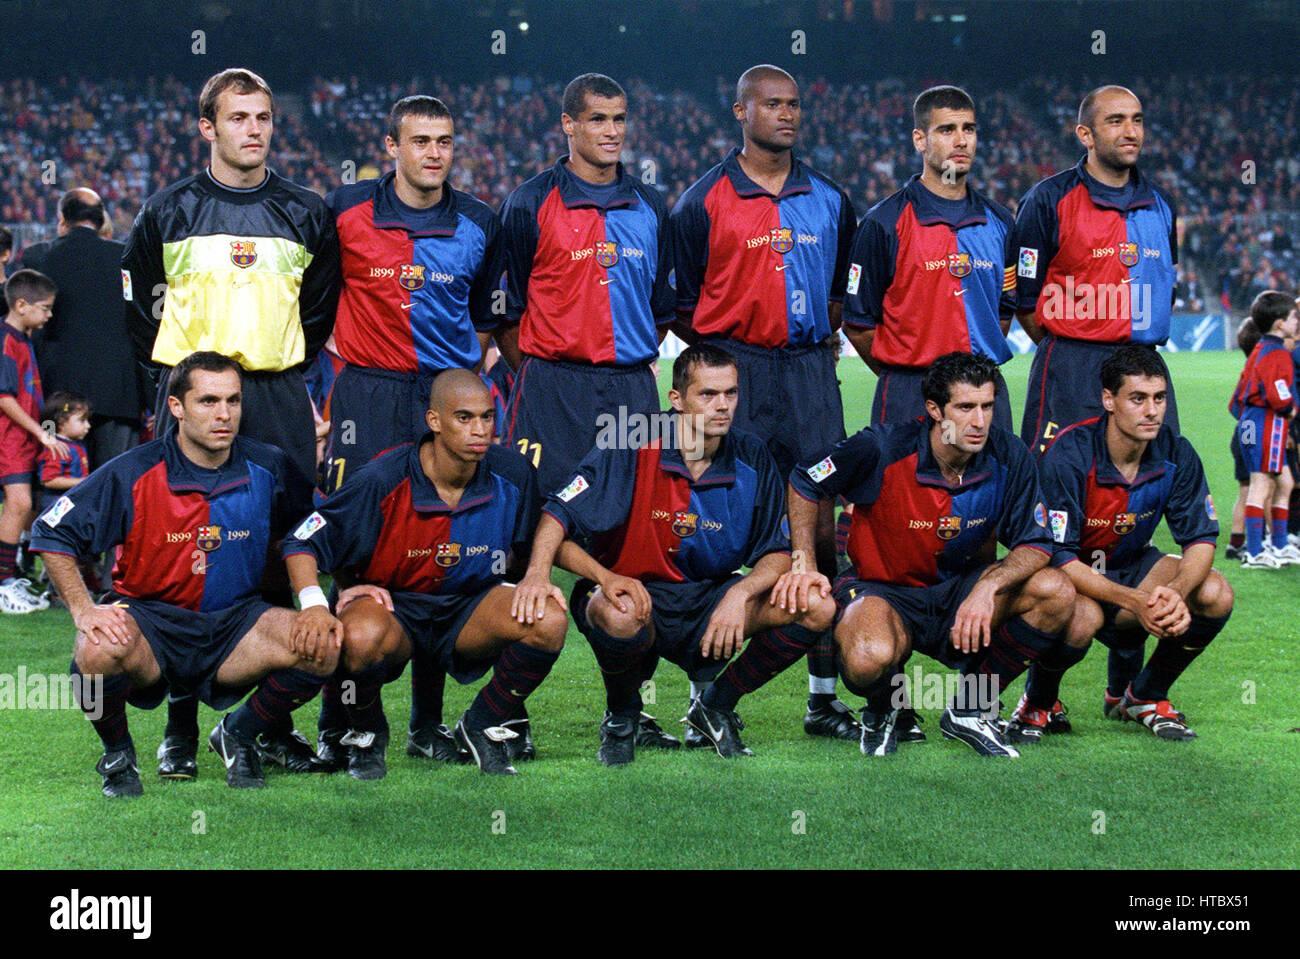 613d27bcc04 FC BARCELONA TEAM GROUP 07 November 1999 Stock Photo  135486317 - Alamy